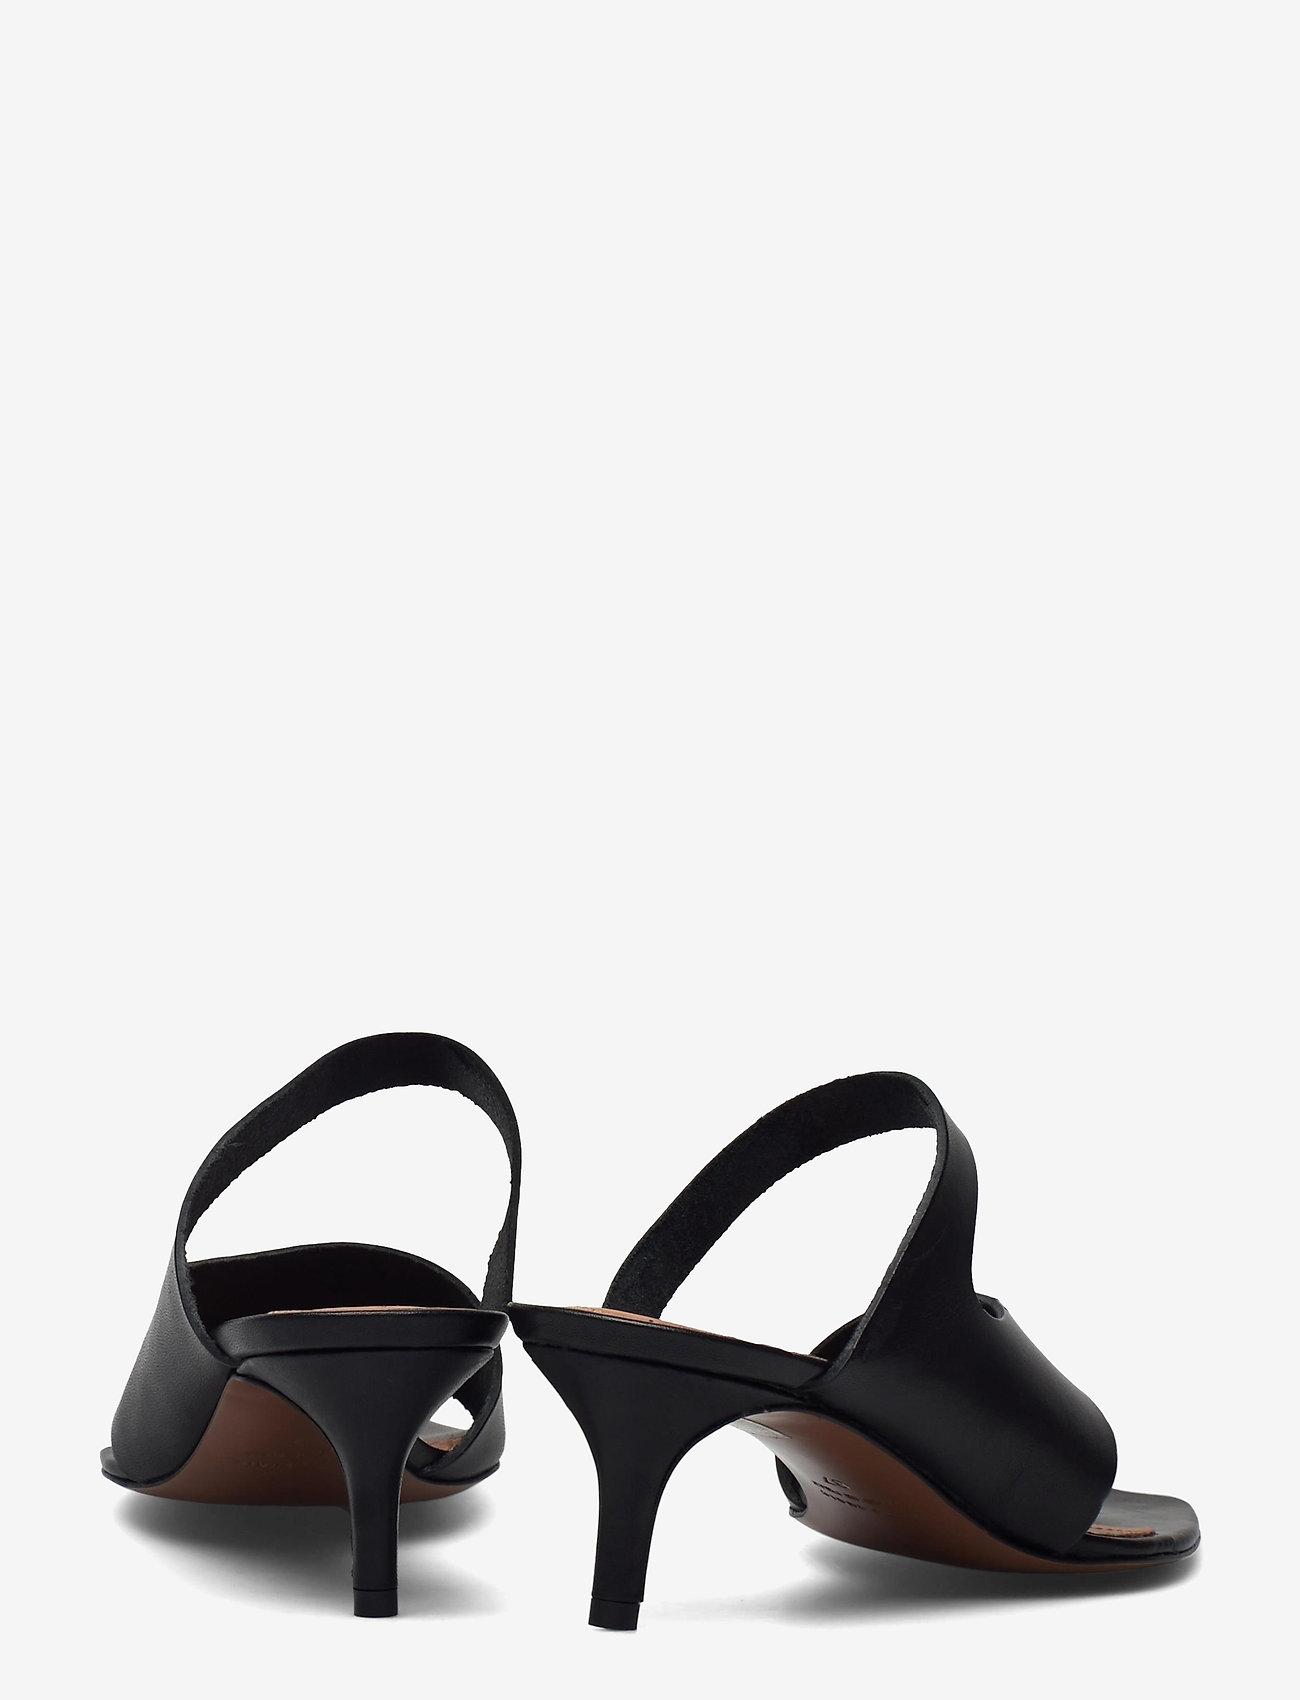 ATP Atelier - Pittuini Black Vacchetta - högklackade sandaler - black - 4